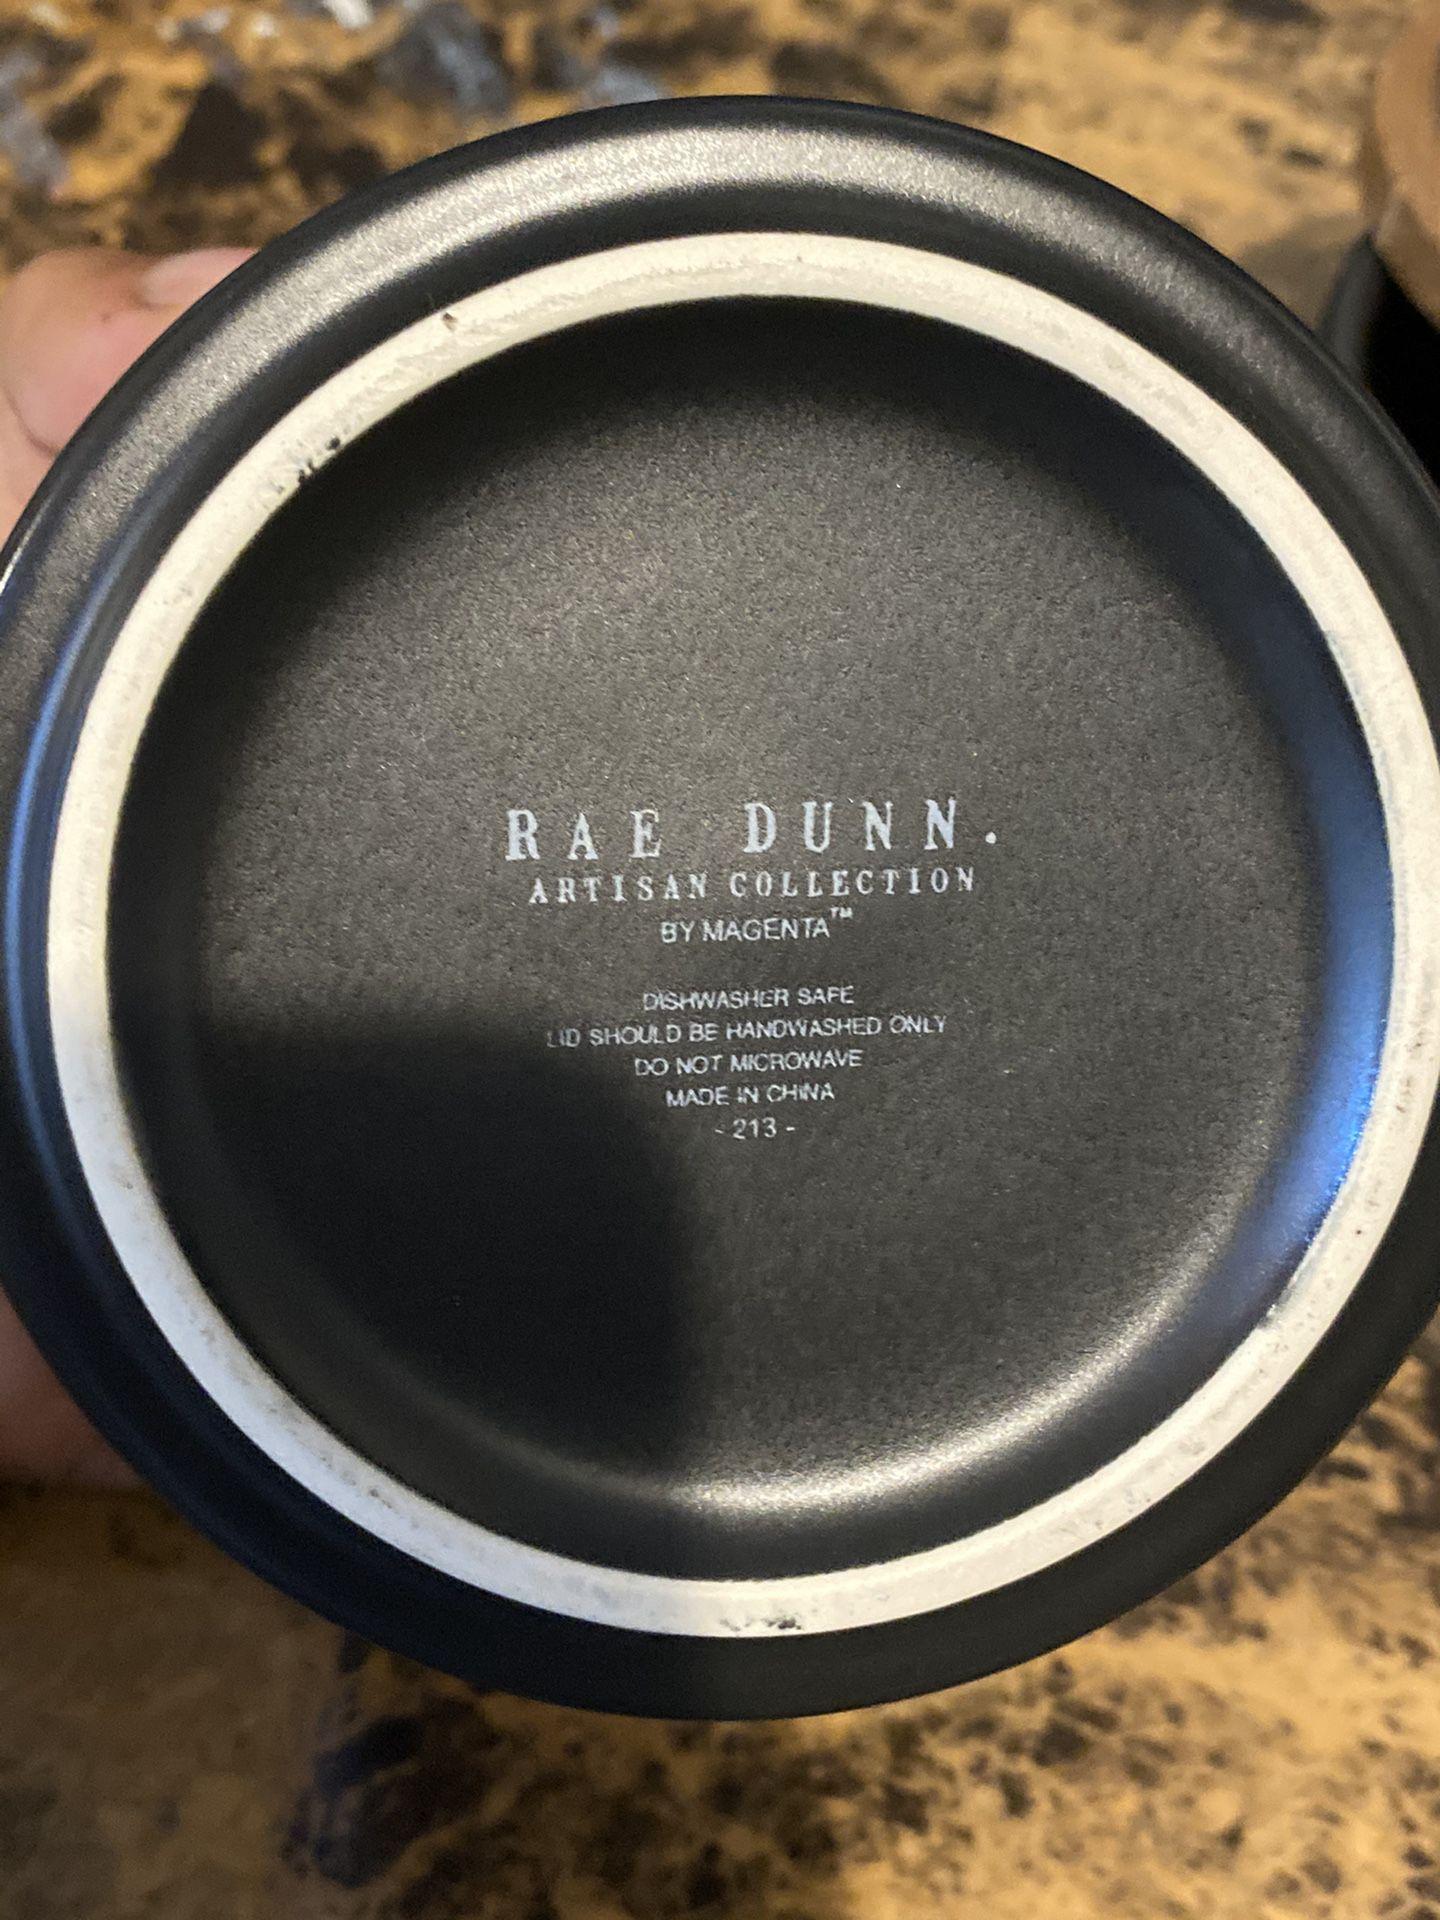 Rae Dunn Ceramic Spice Jar set with wood tops